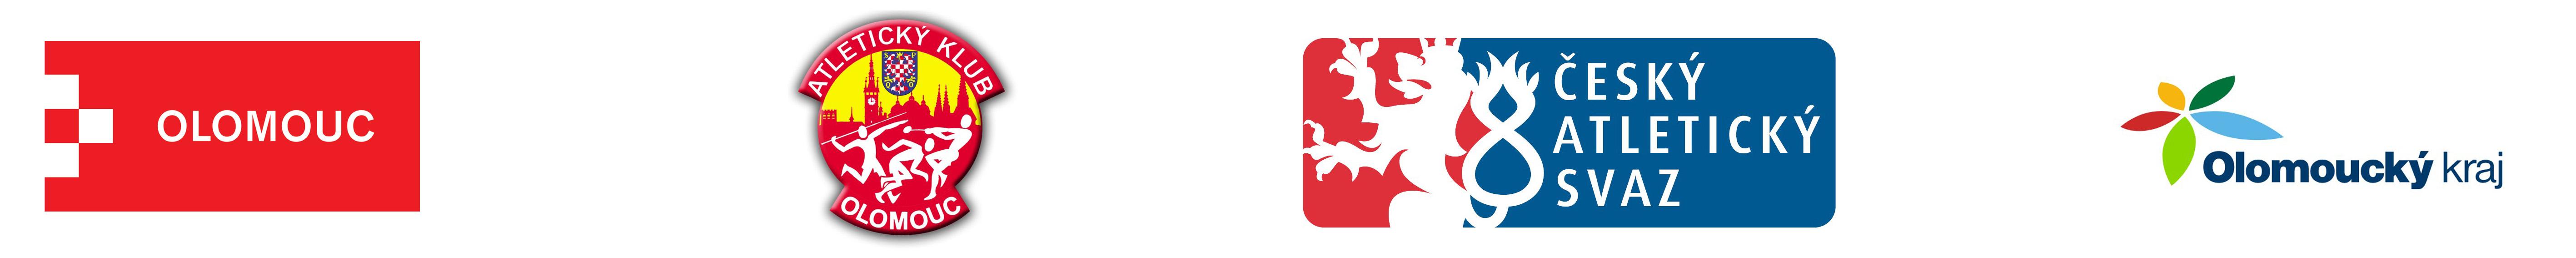 Logo_AK_ČAS_Mesto_Kraj_malé